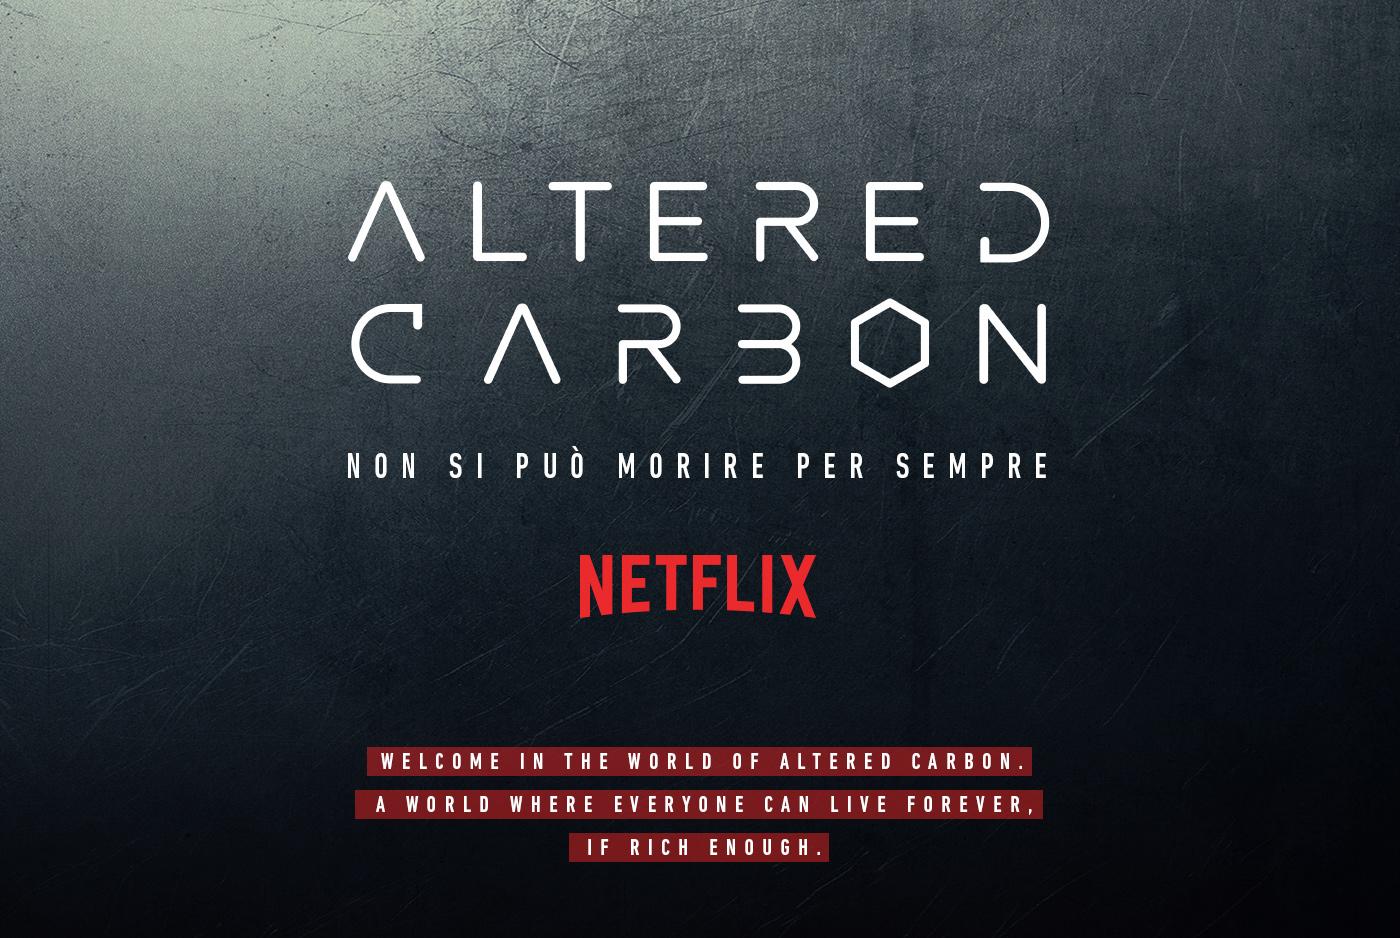 Netflix alteredcarbon OOH motion store activation shop body magnini commercial